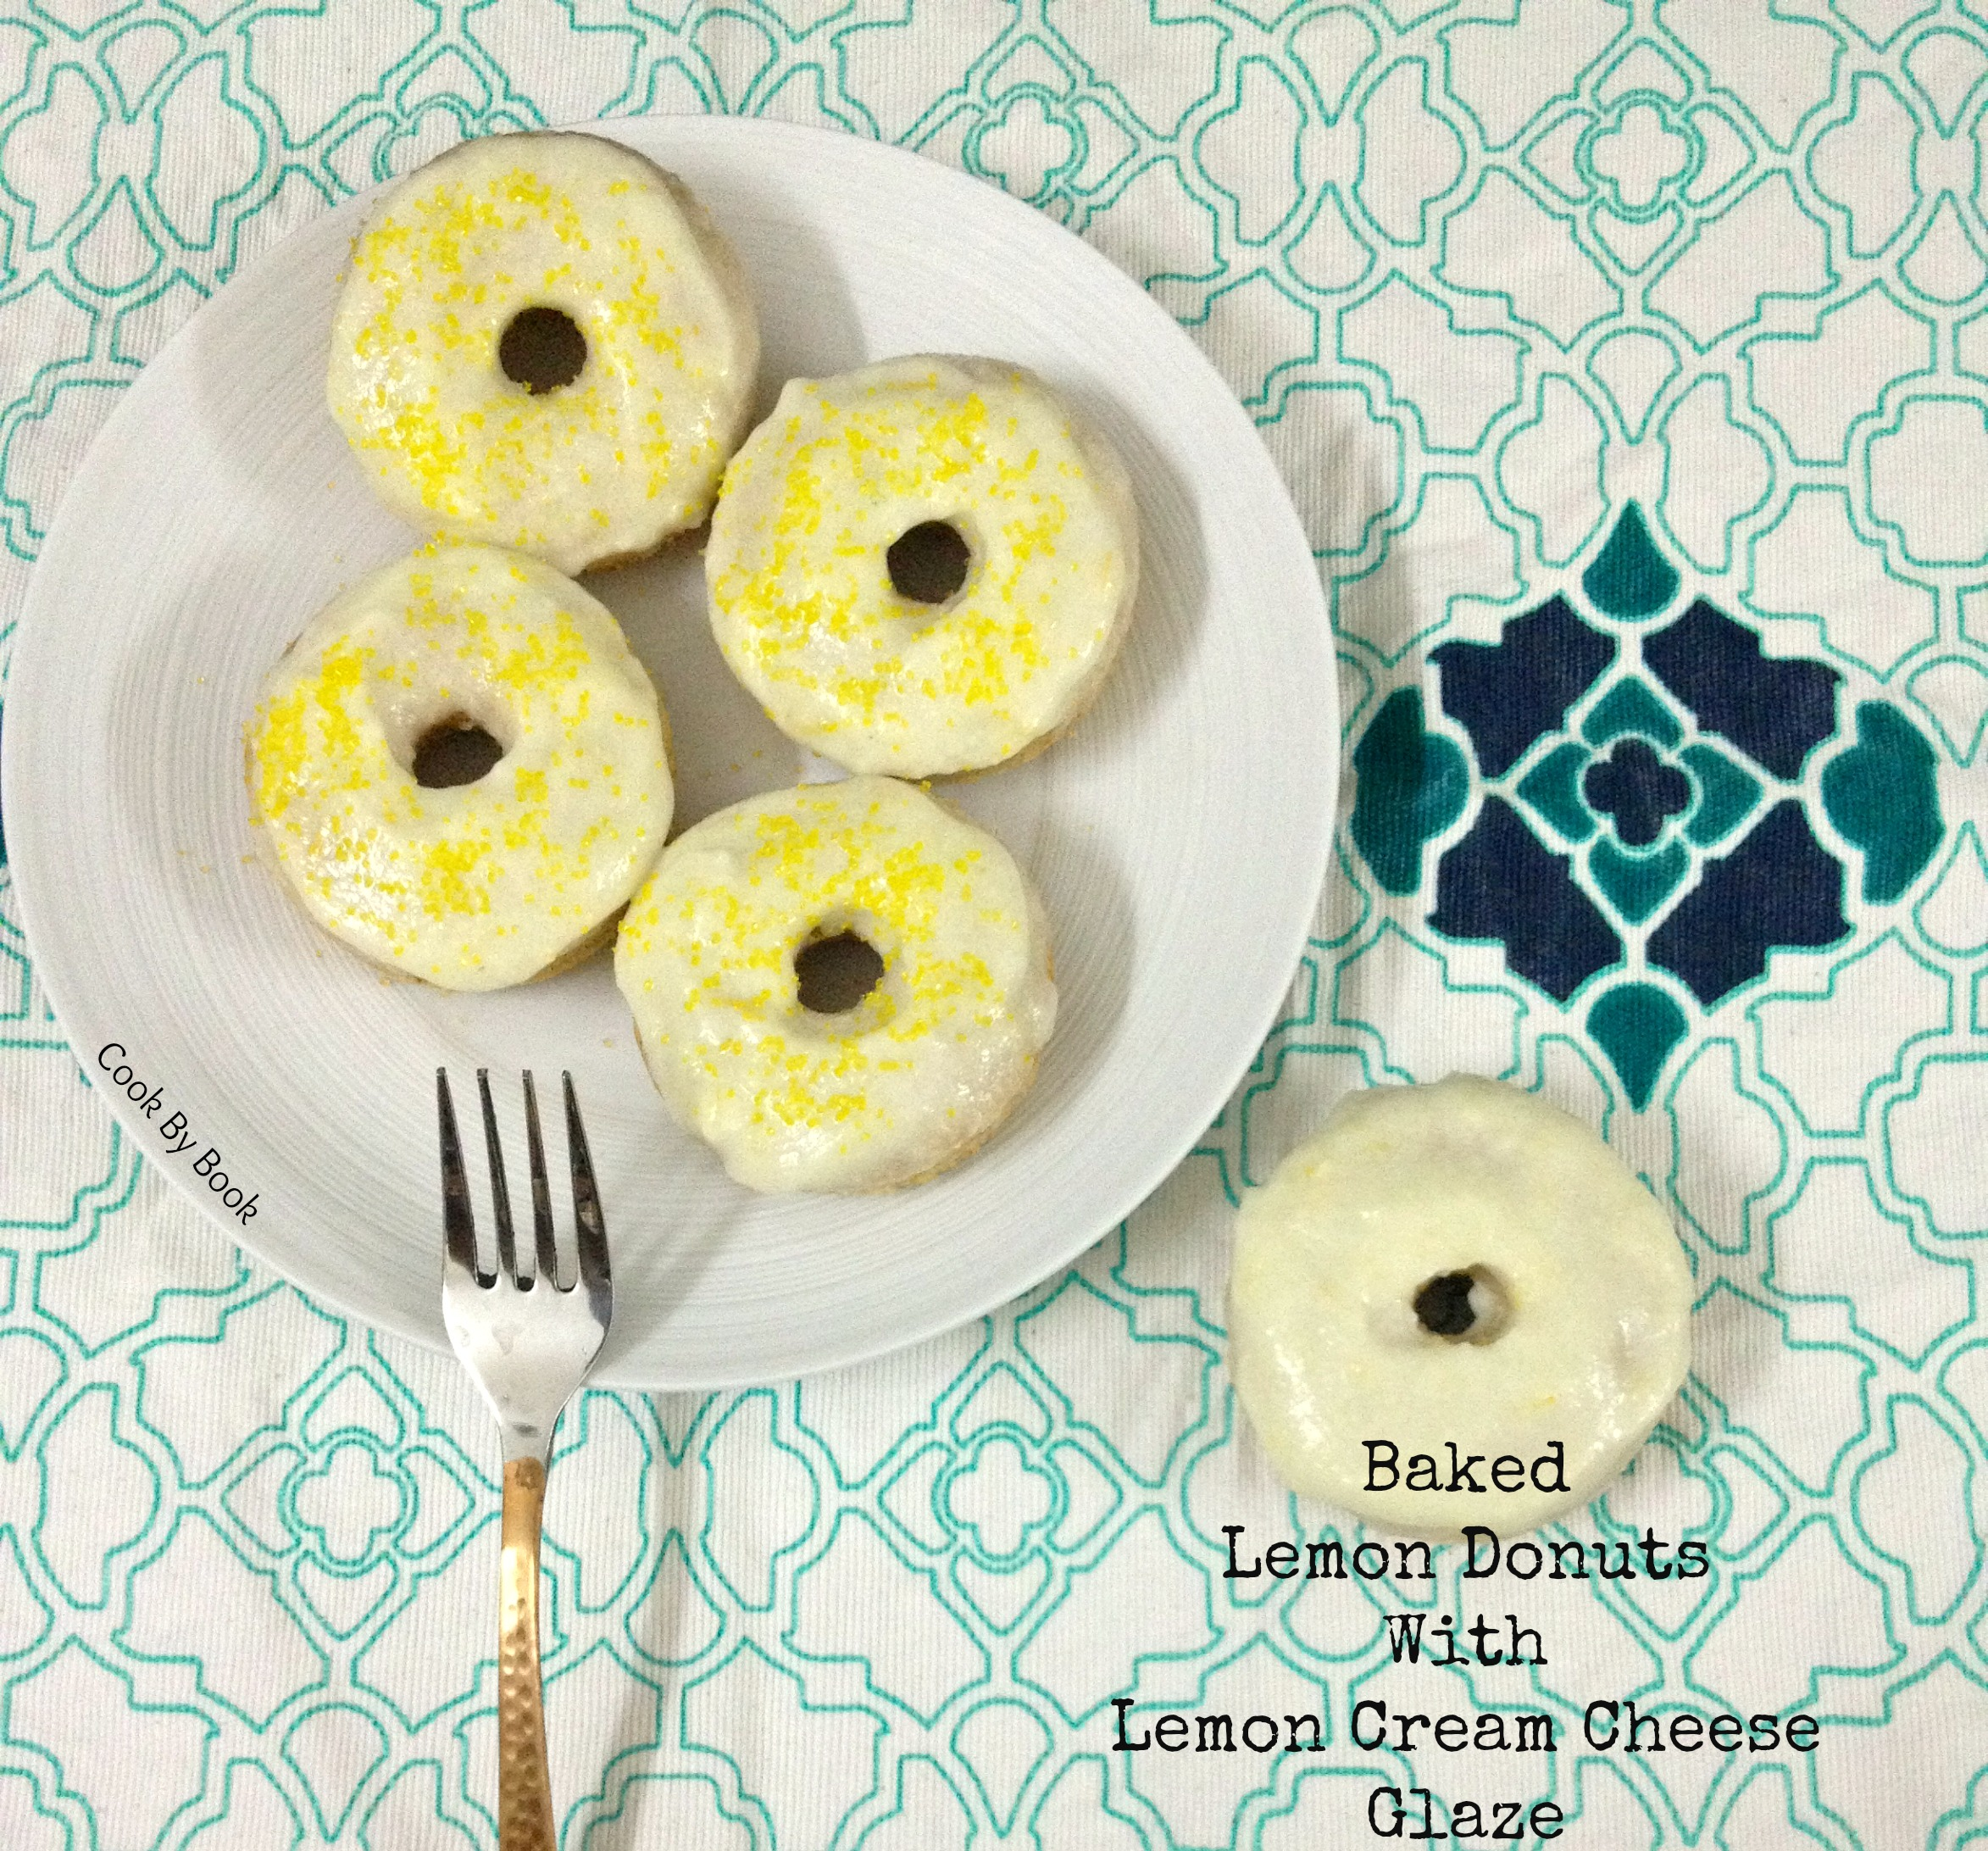 Baked Lemon Donuts with Lemon Cream Cheese Glaze1